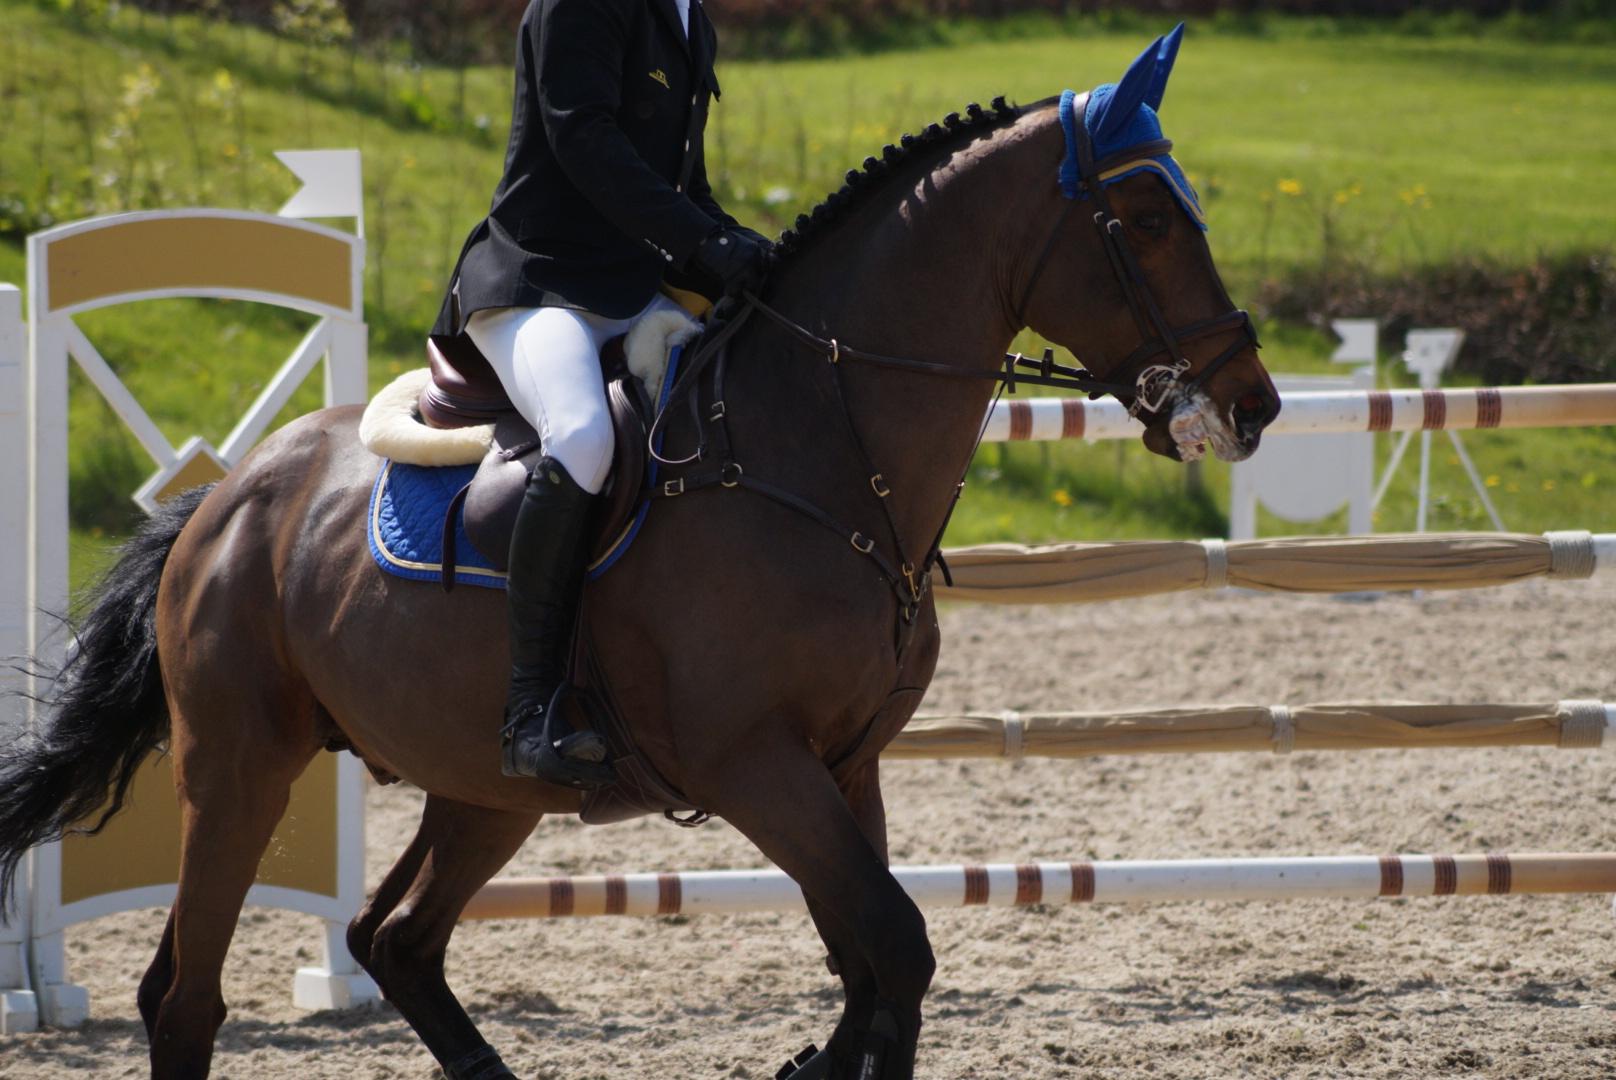 bay horse show - photo #2